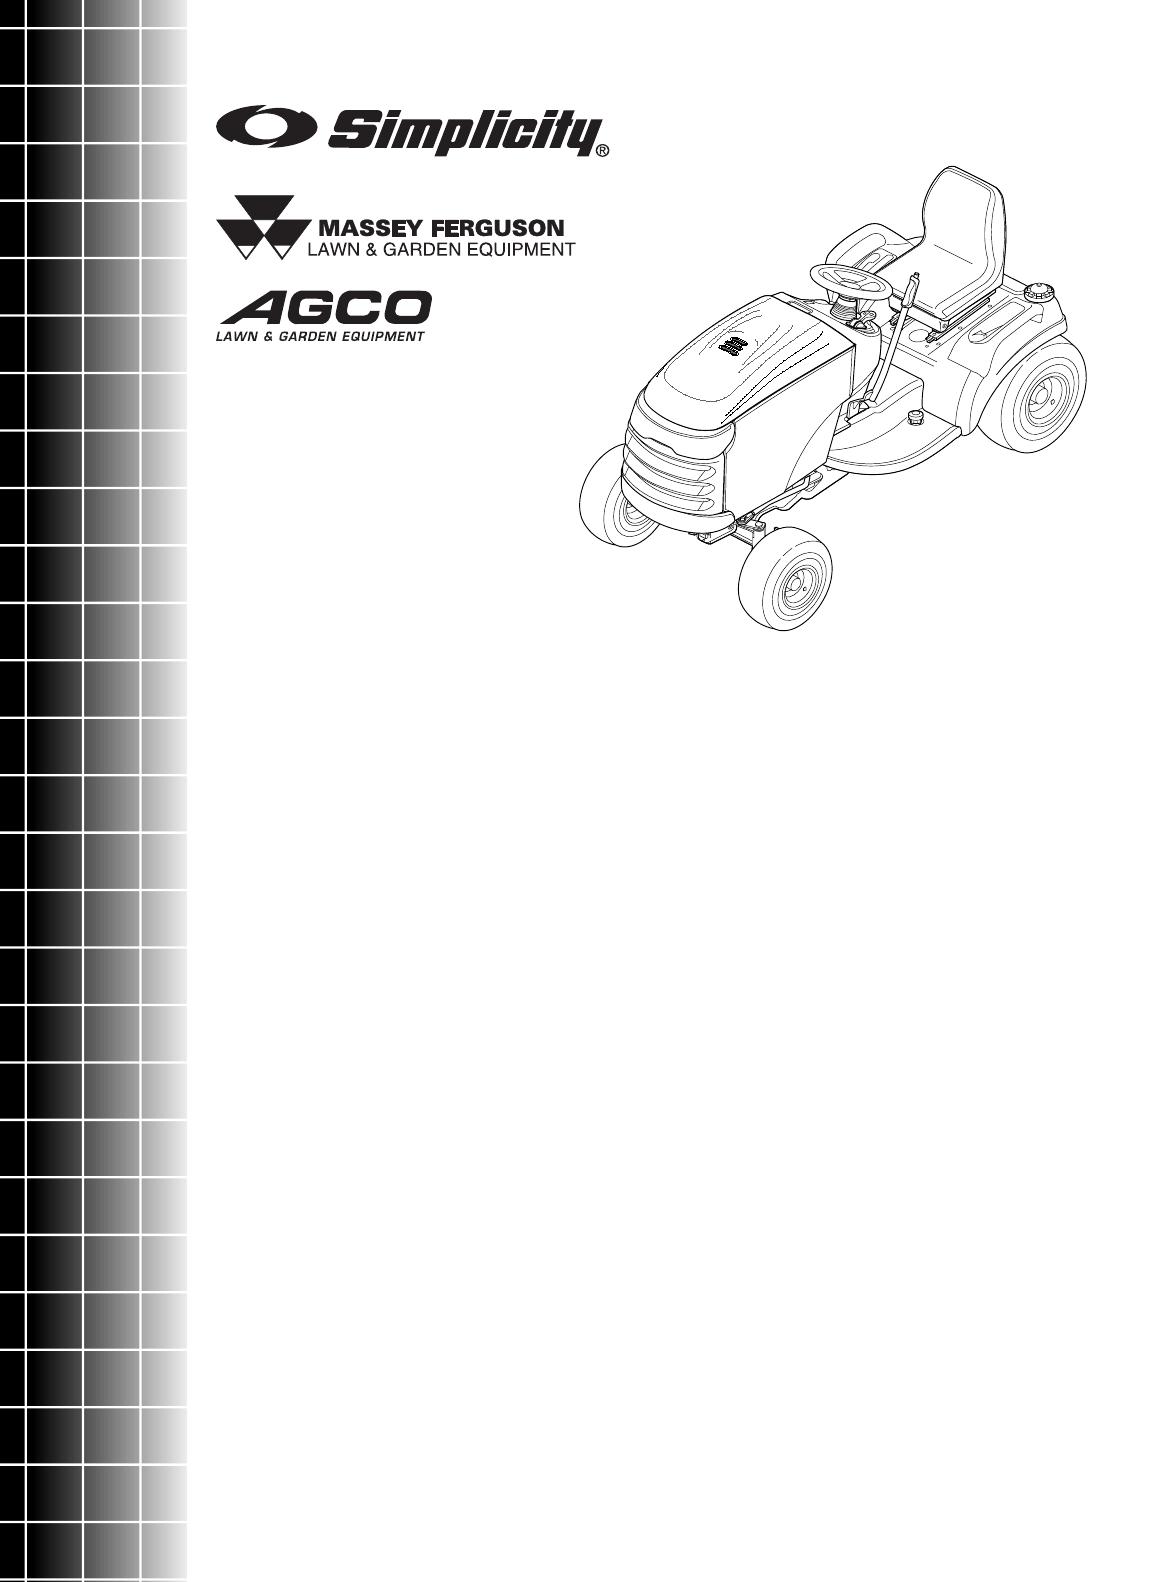 Simplicity Conquest 2700 Parts Manual / 1700 Series Garden Tractors